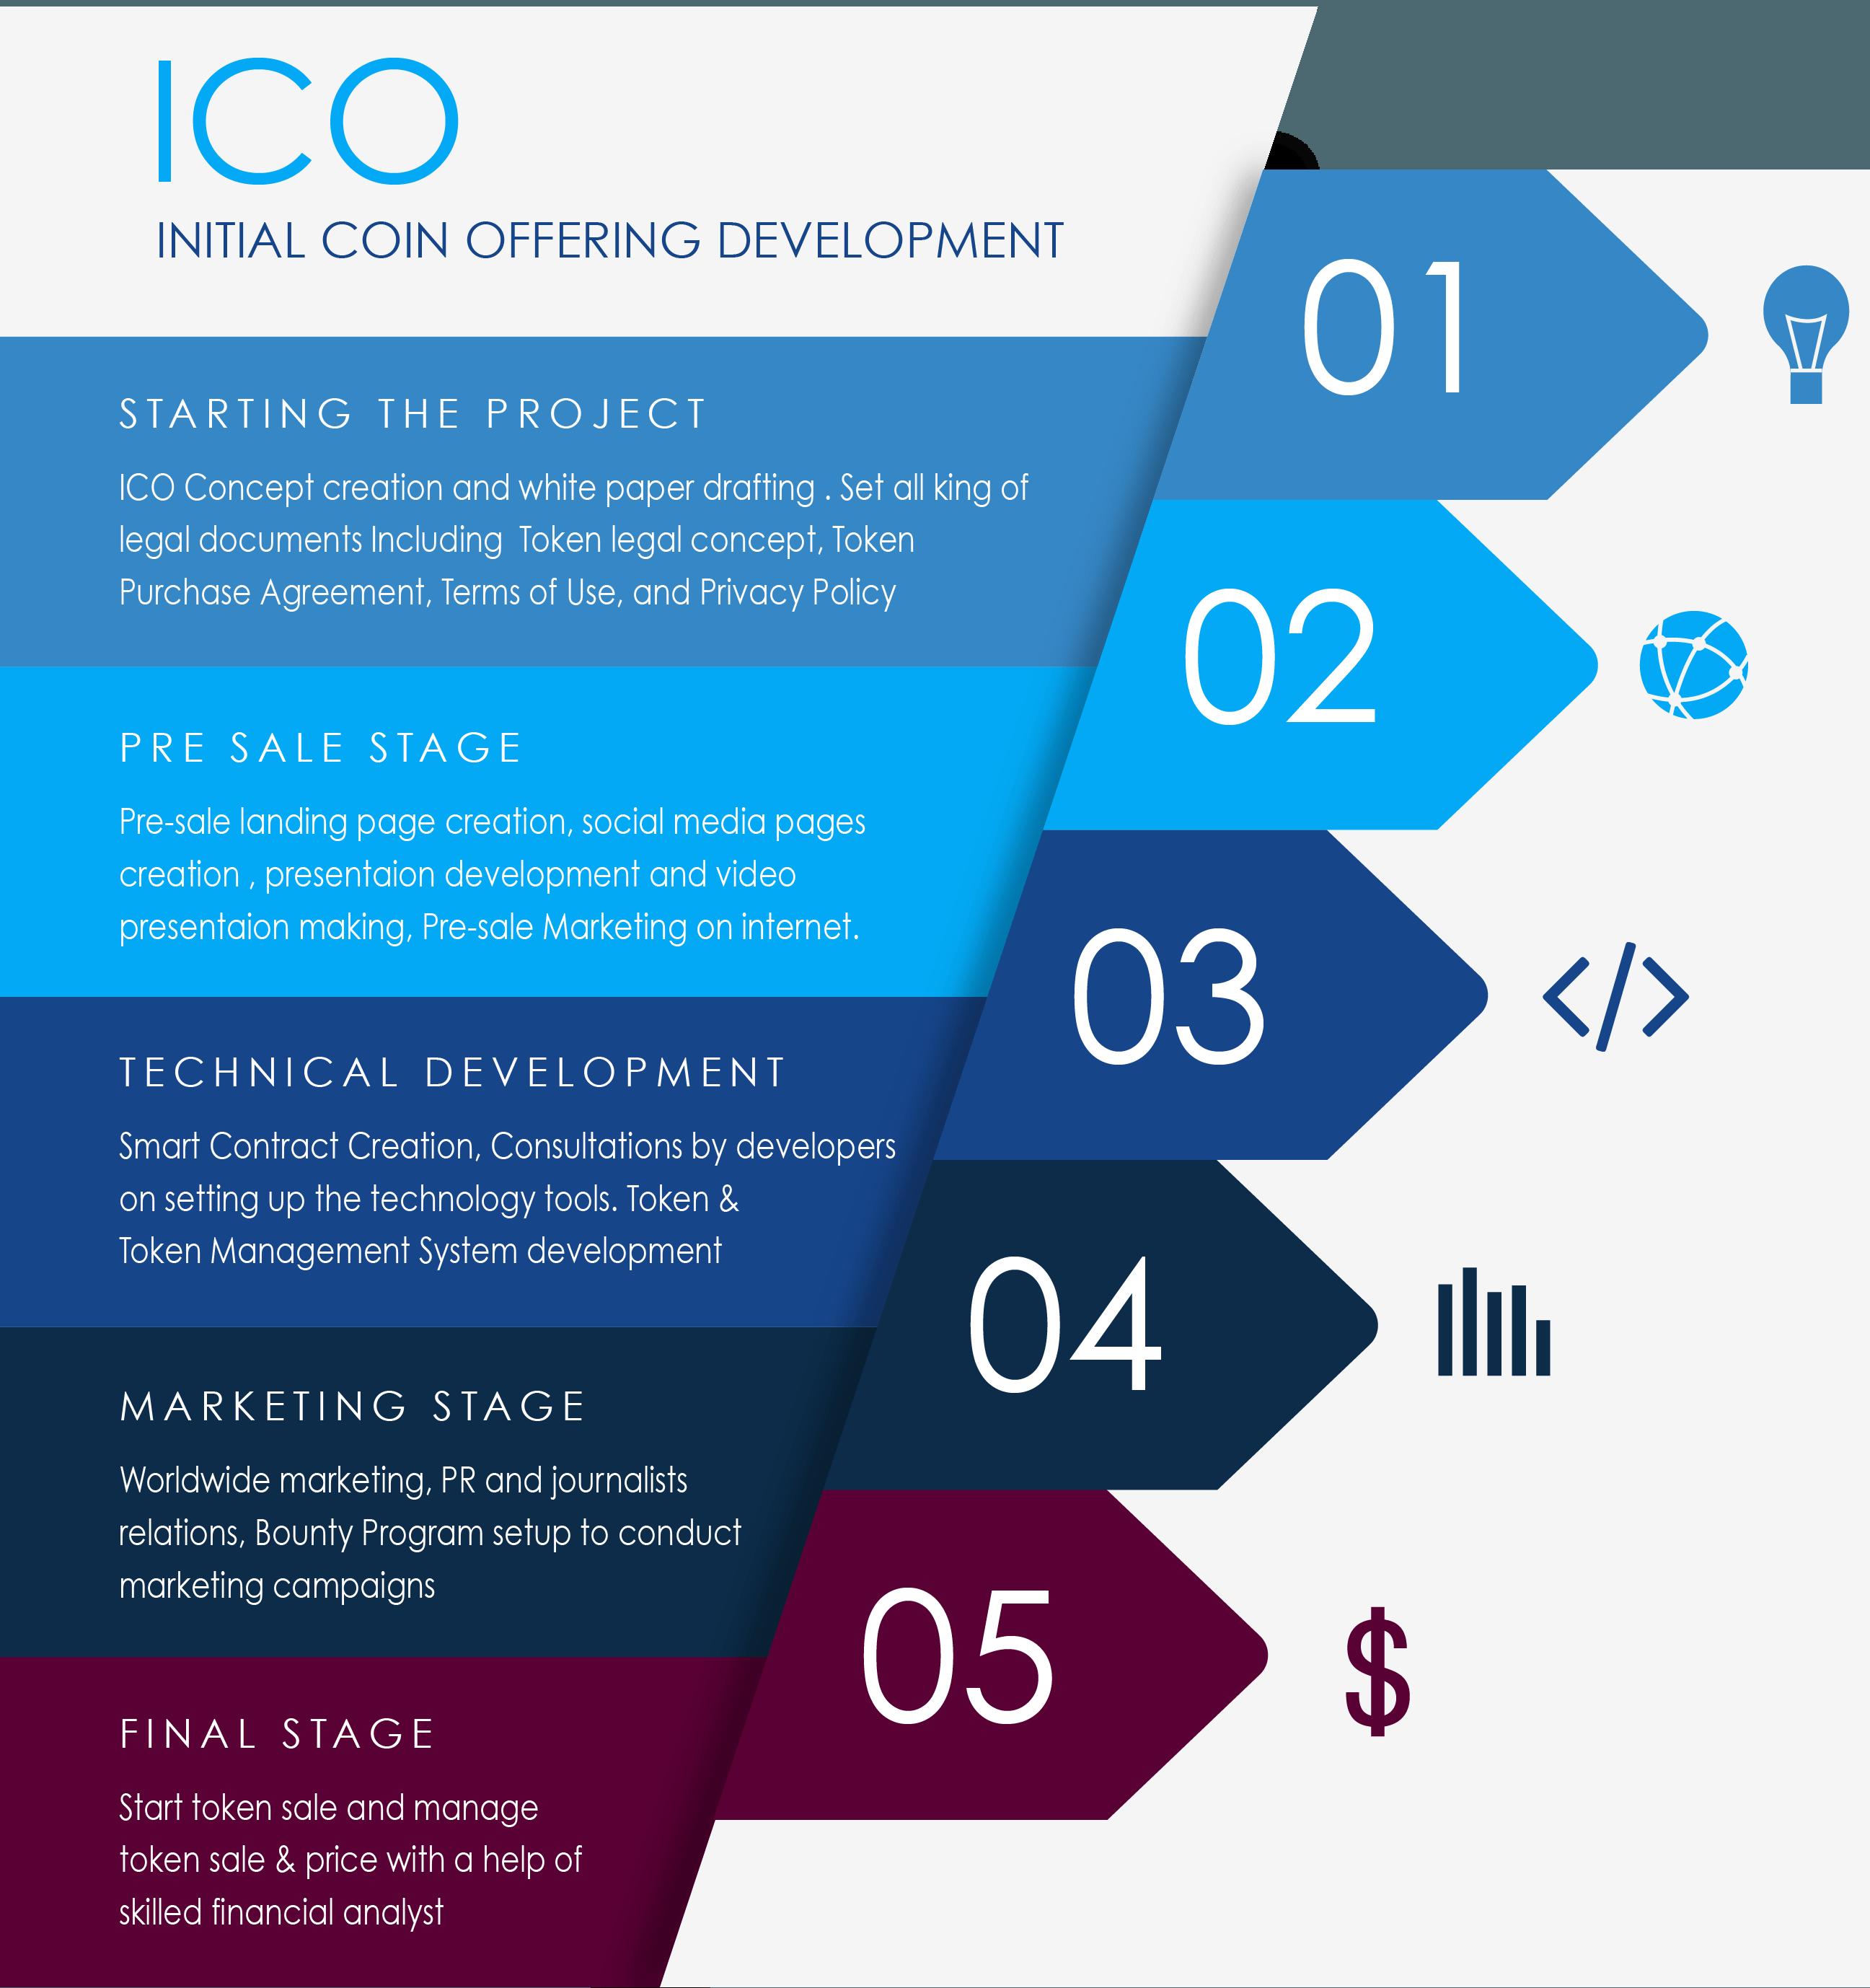 ICO Development Company Hire Initial coin offering Developer